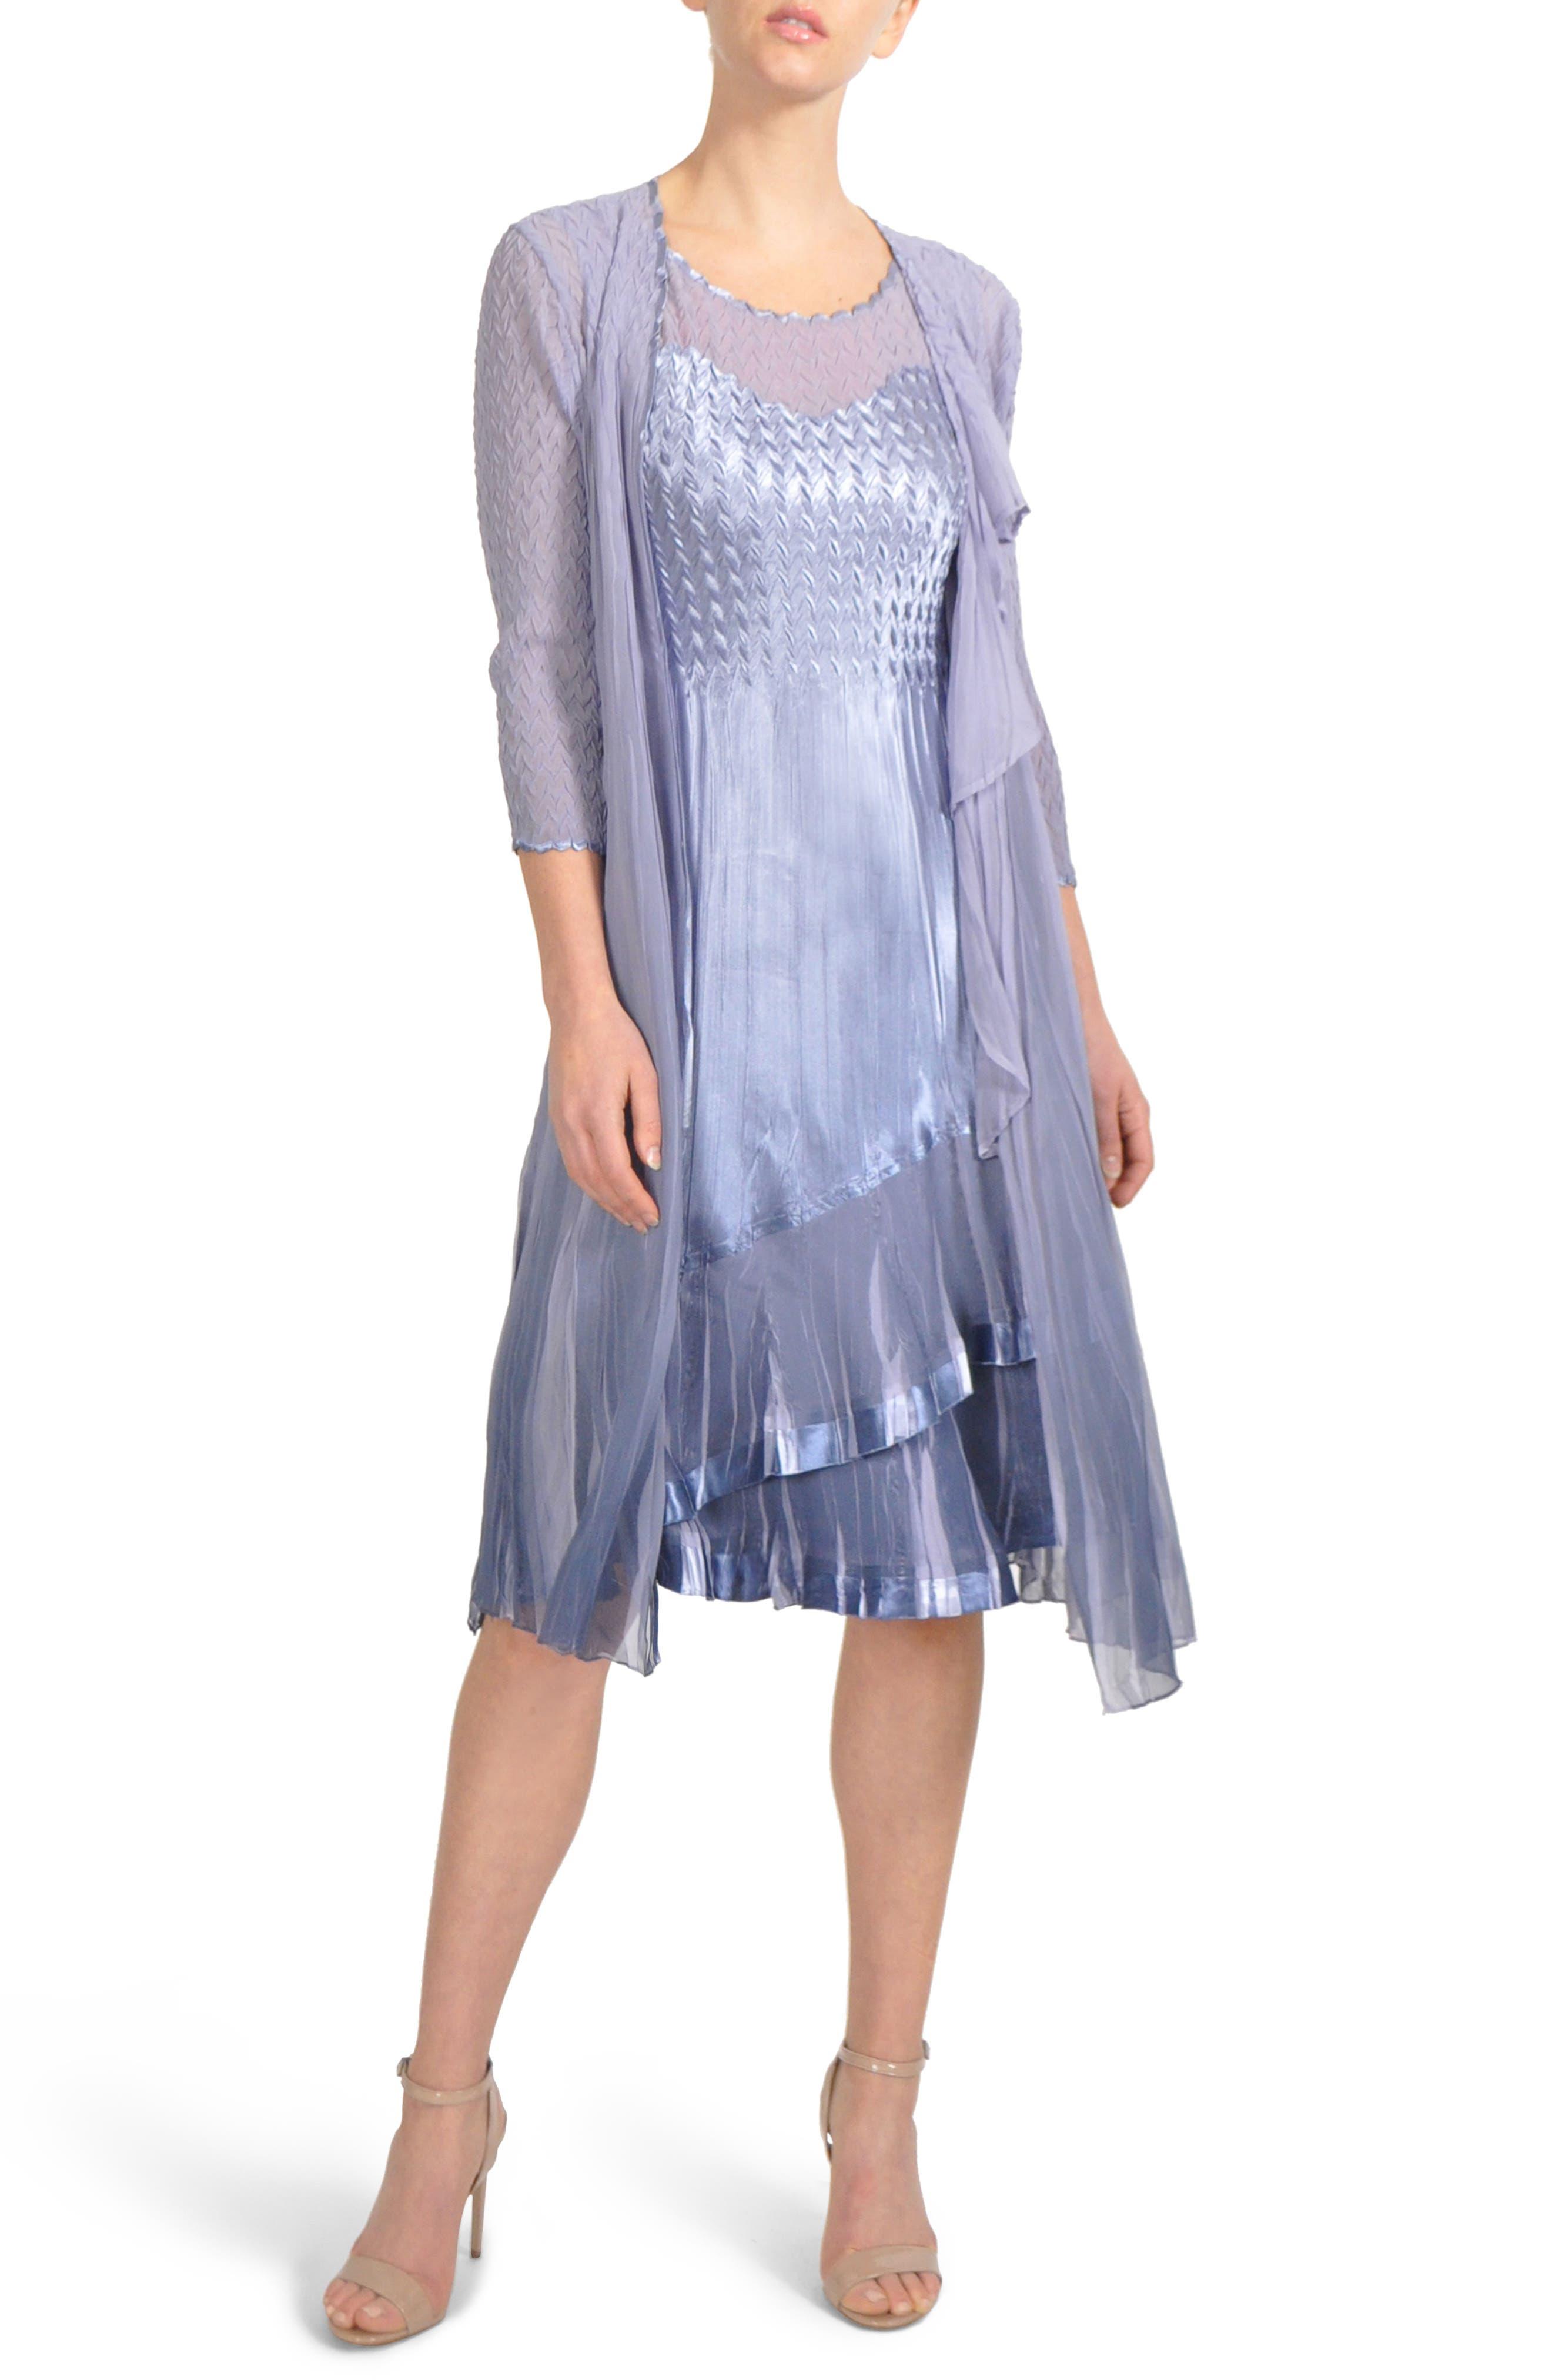 Charmeuse & Chiffon Midi Dress with Jacket,                         Main,                         color, Lavendar Grey Blue Ombre